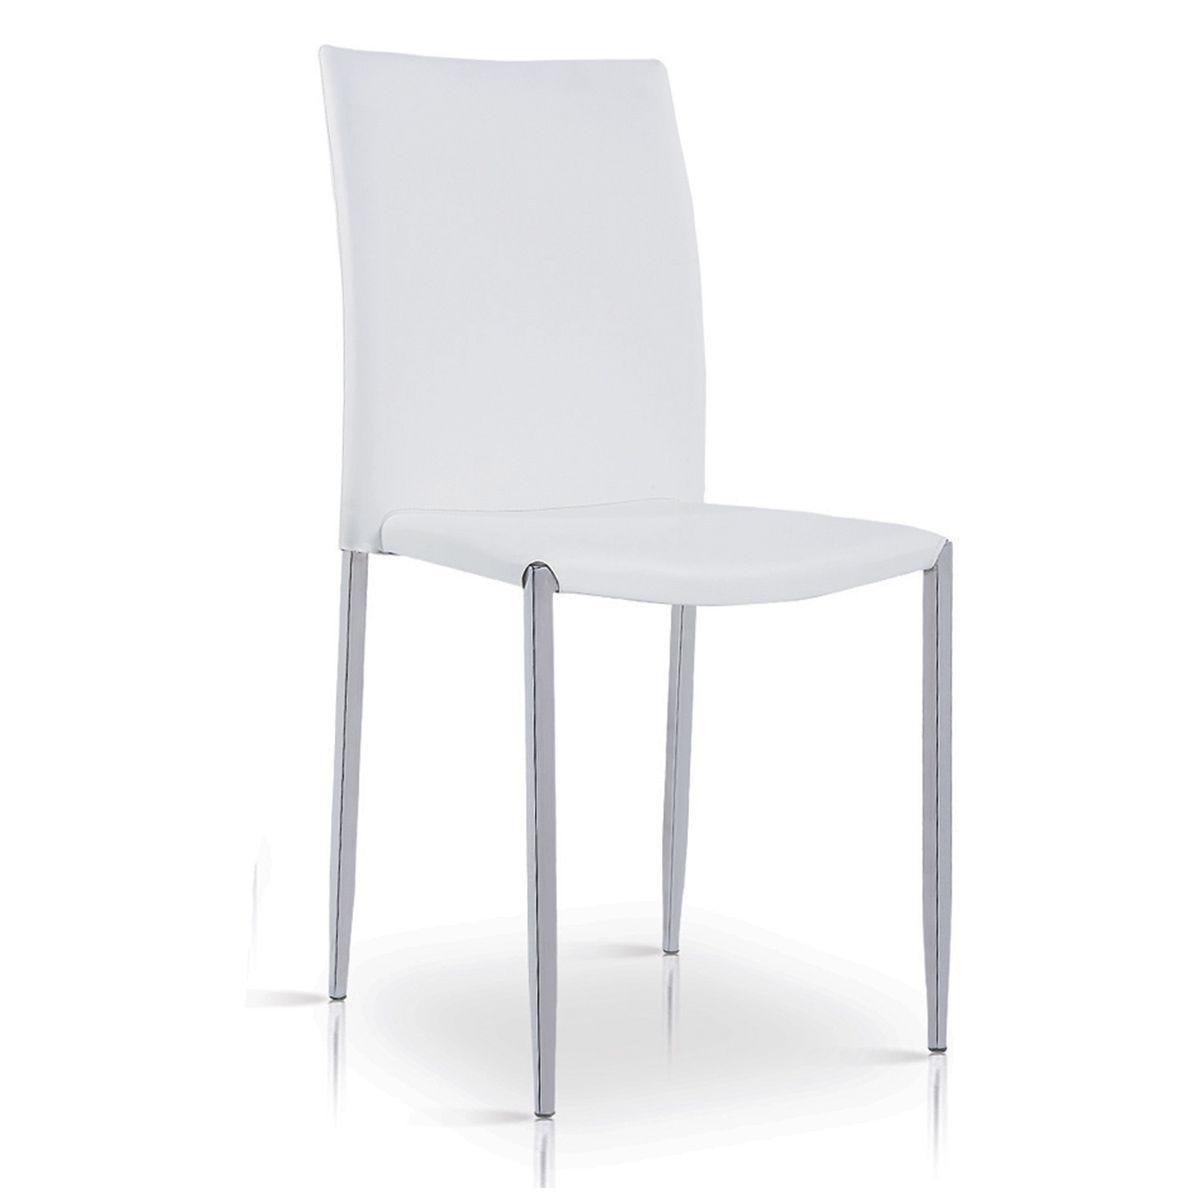 Set Of 4 Iris Faux Leather Chairs - White/Chrome